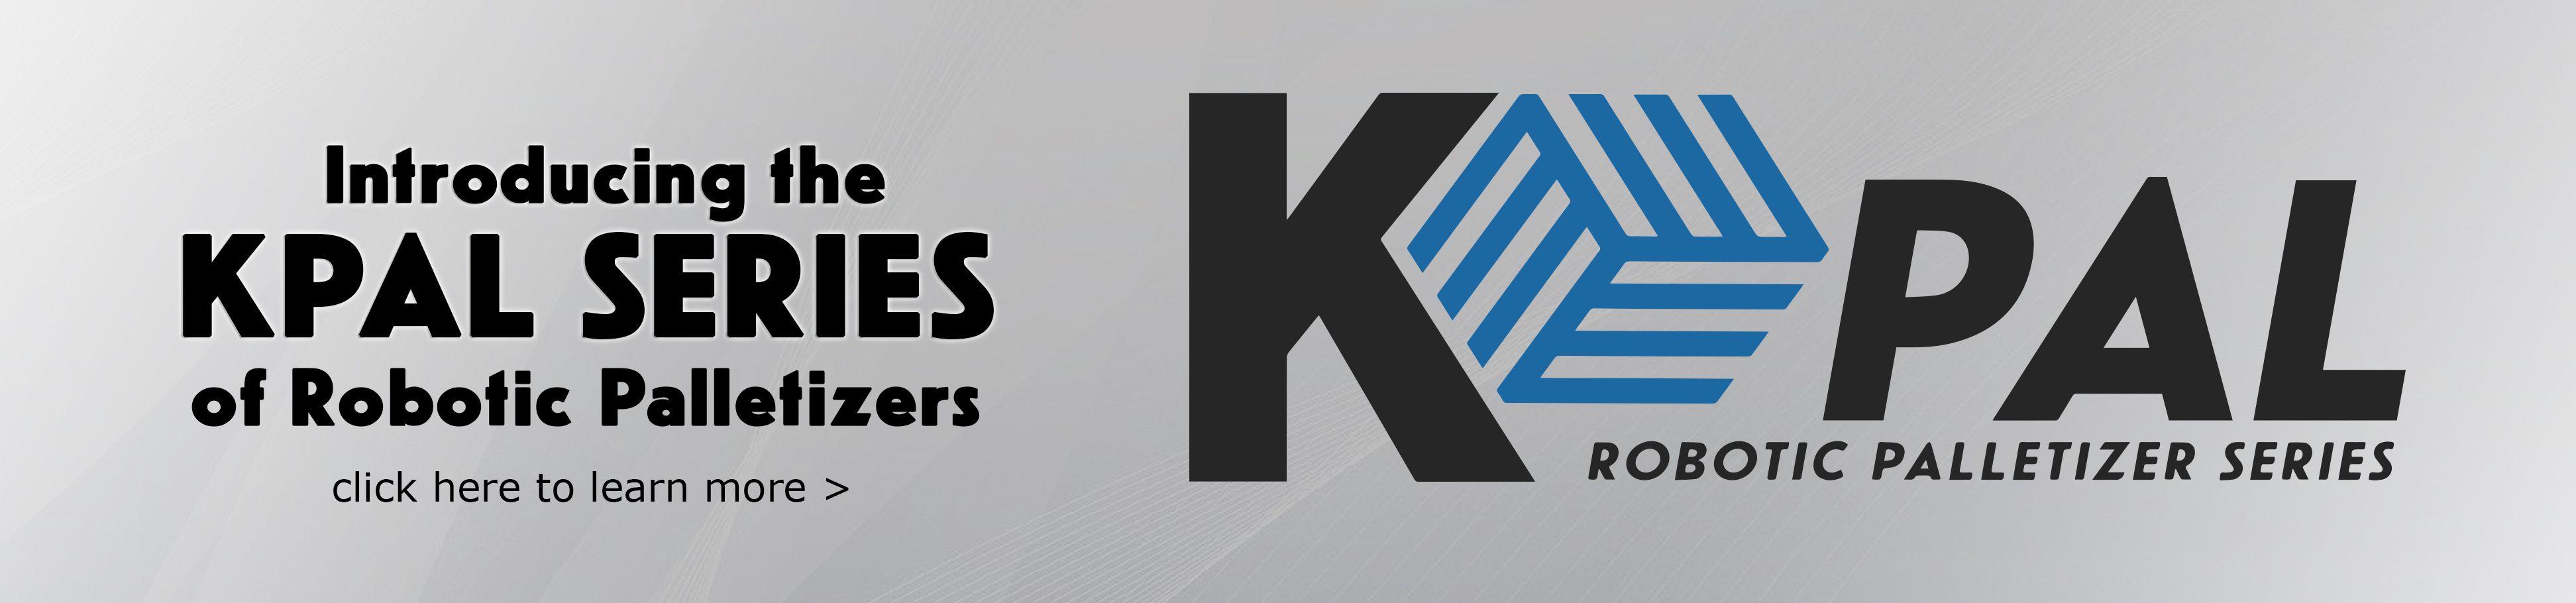 KPal SeriesB.jpg